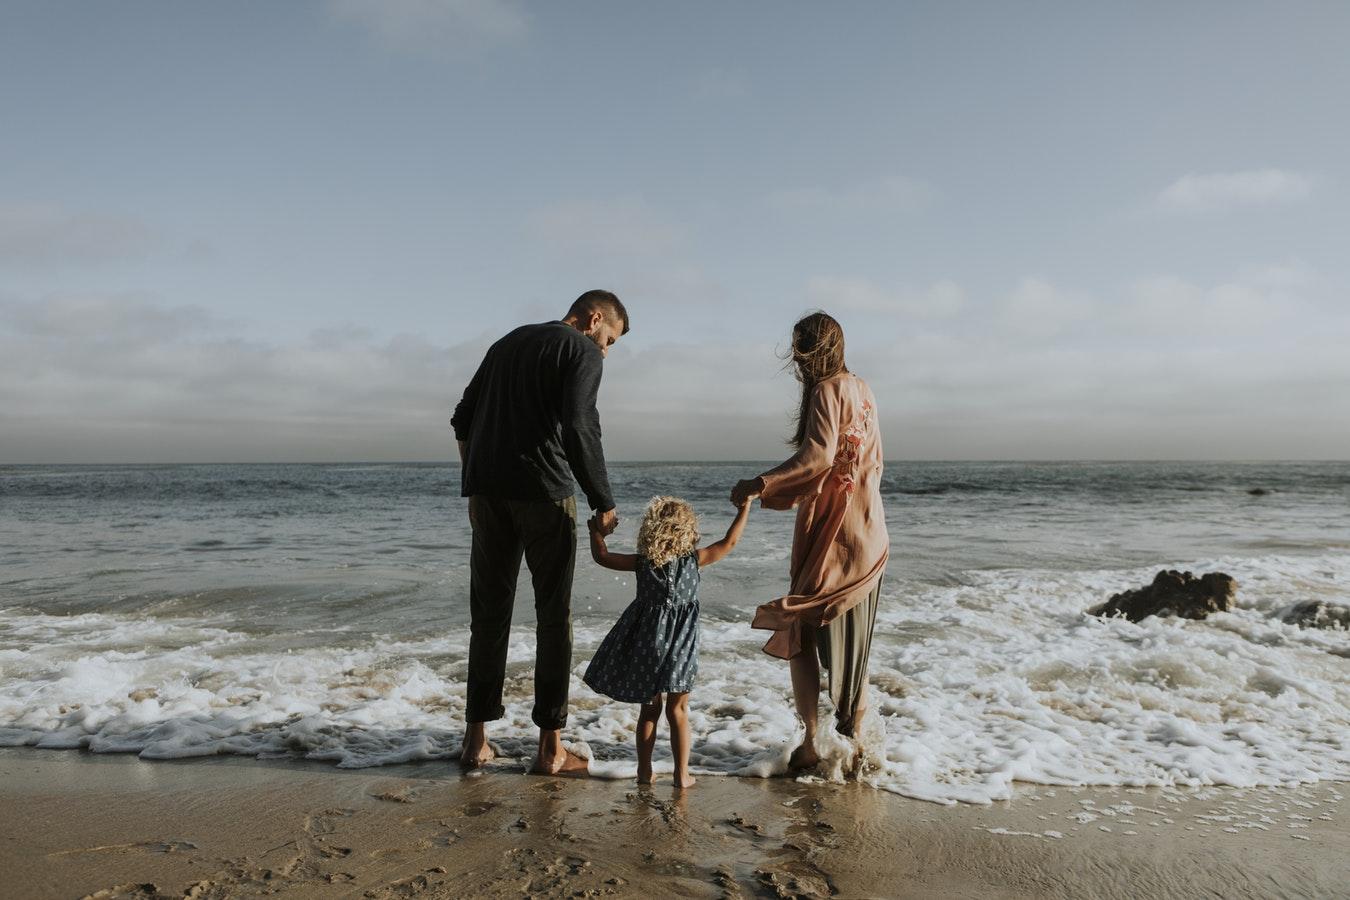 Familie am Meer Rechtsschutz für alles was kommt